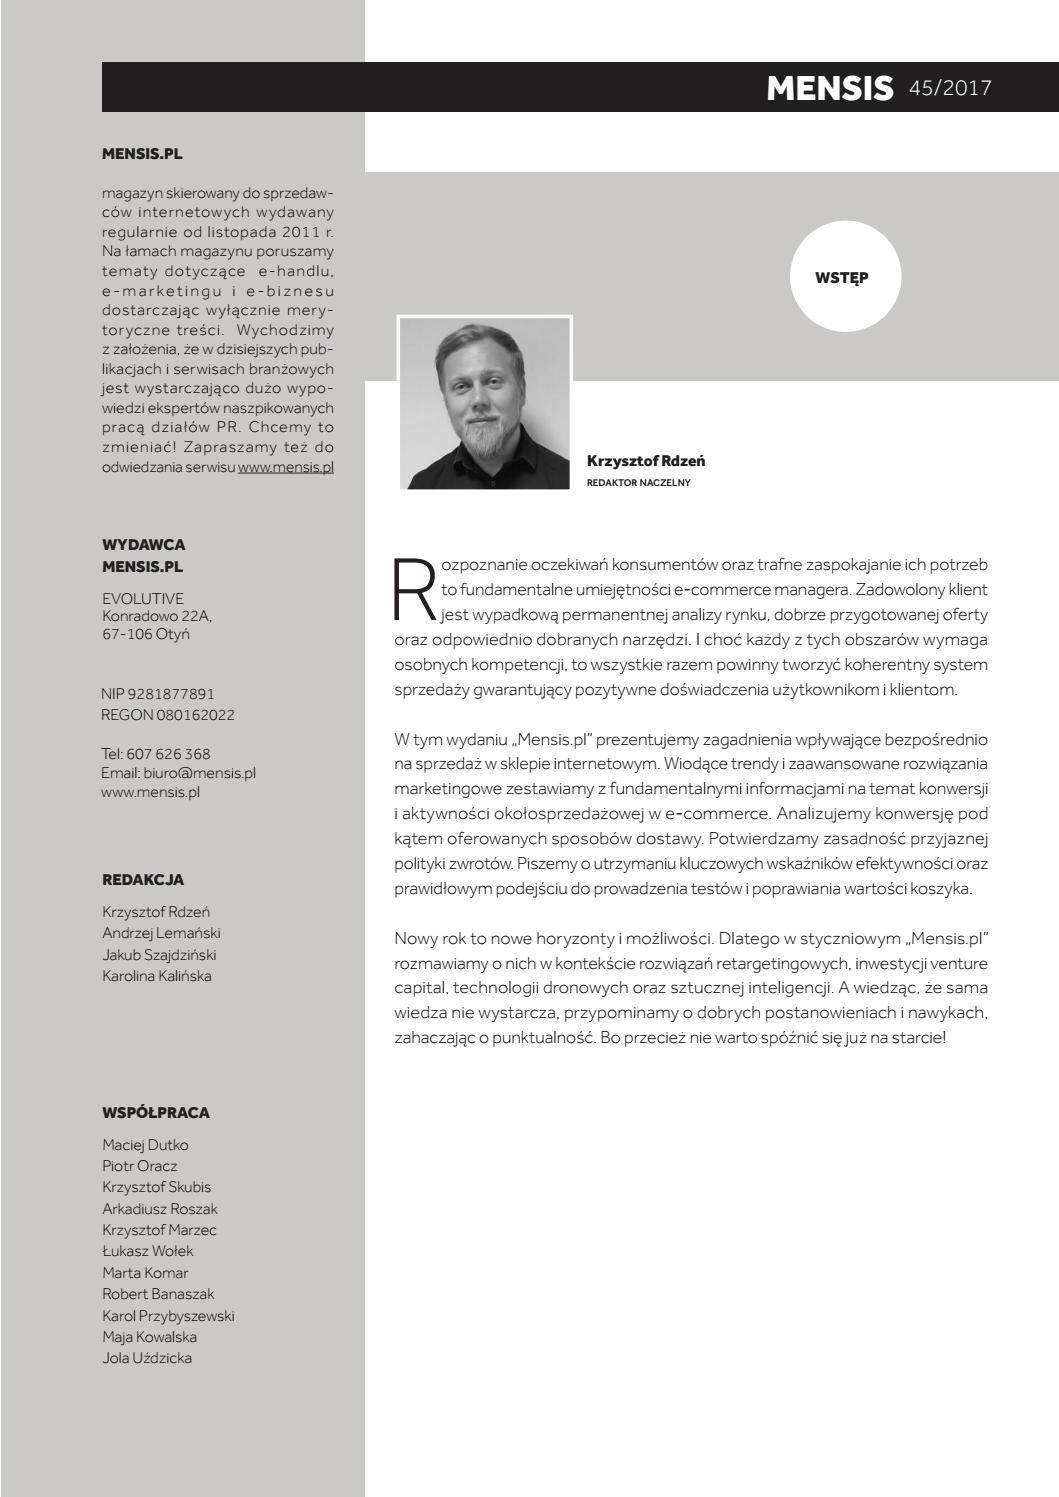 a938f084b74305 Mensis.pl - magazyn e-commerce nr 45 by Krzysztof Rdzeń - issuu